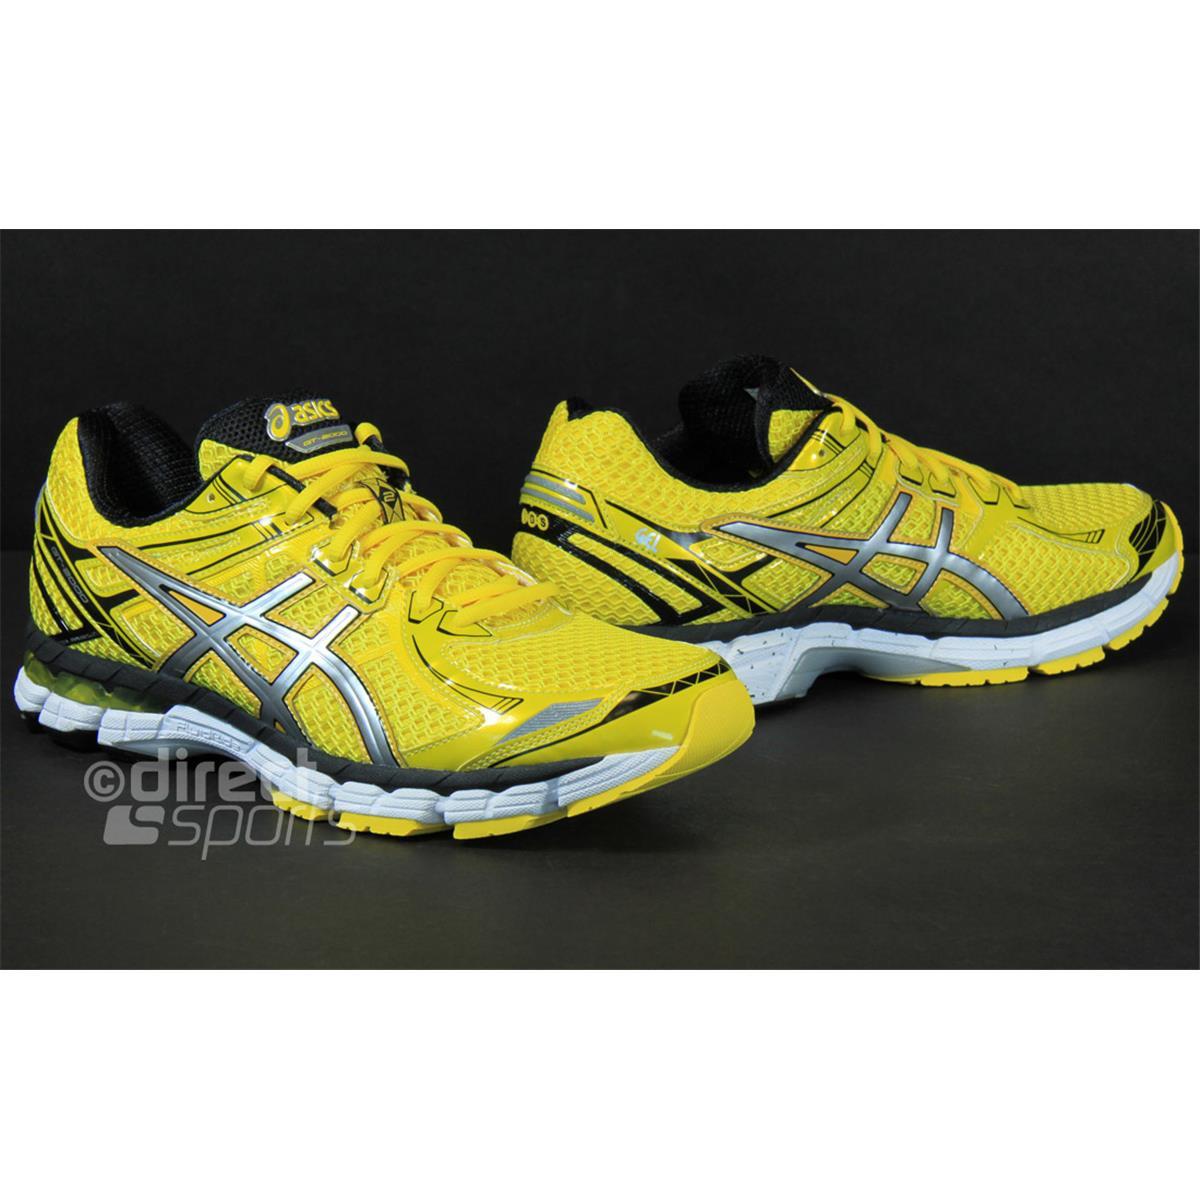 asics gt 2000 asics mens running shoes black white yellow